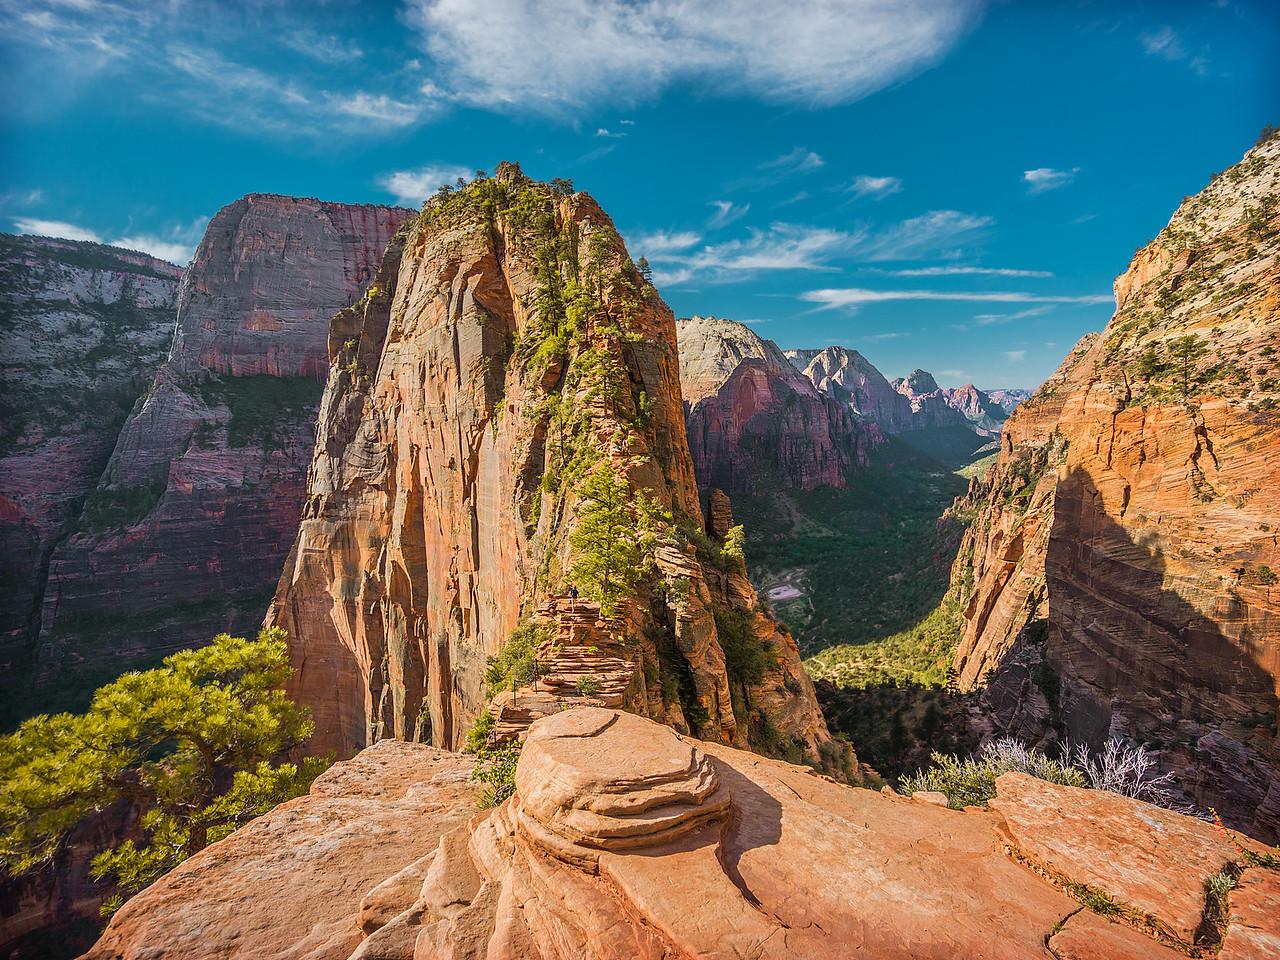 Travel_Photography_Blog_Utah_Zion_National_Park_Angels_Landing_Trail